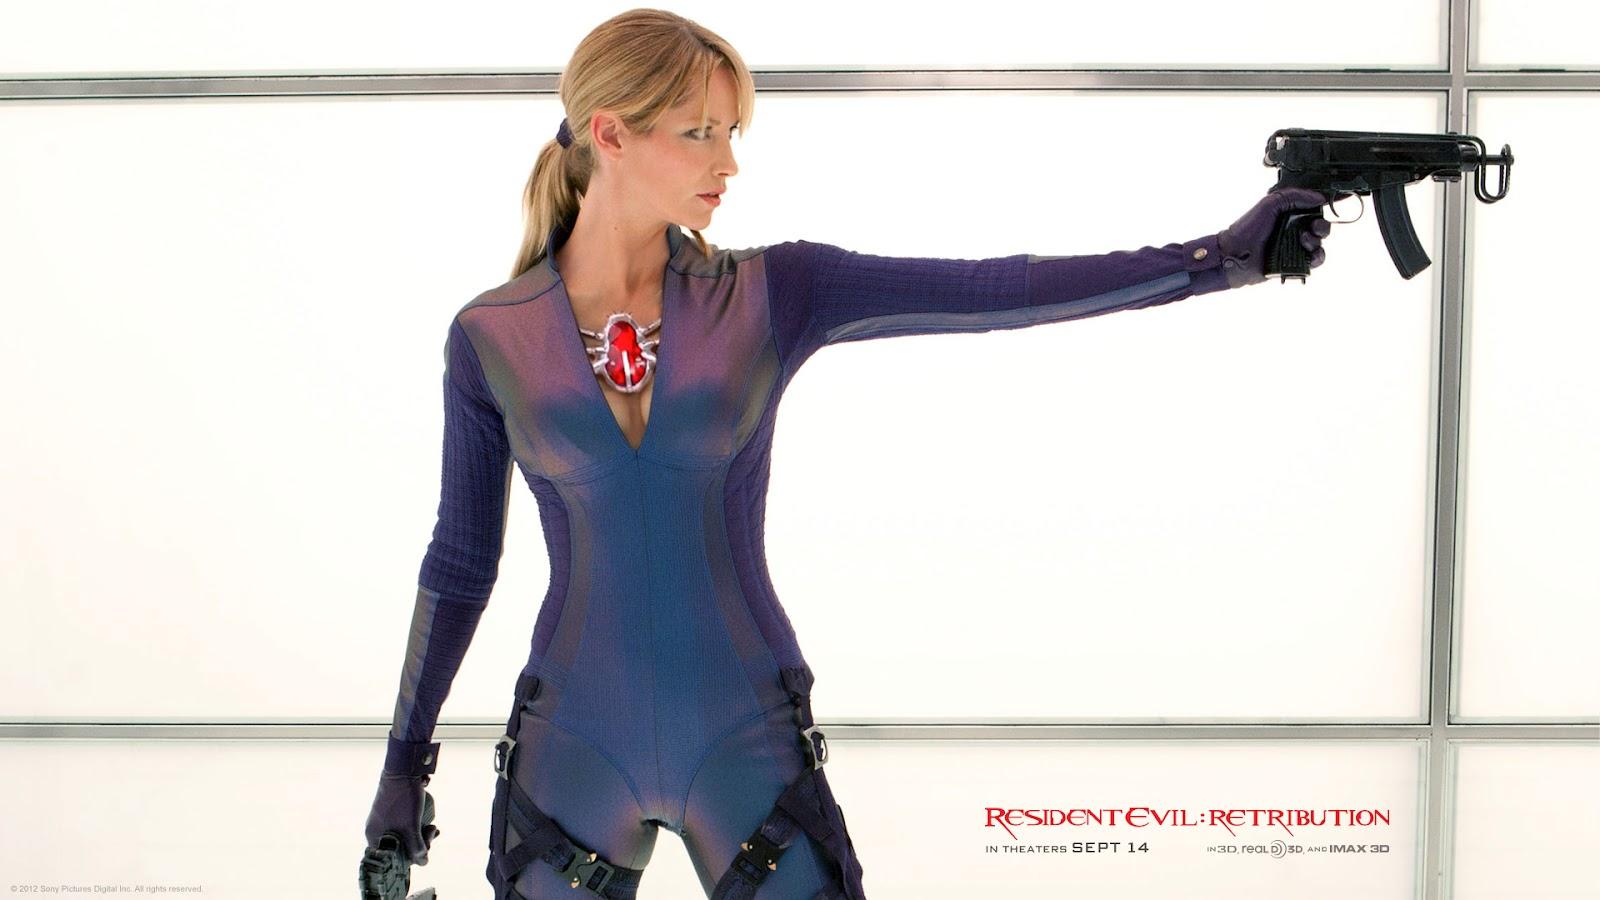 http://2.bp.blogspot.com/-wQCxzLcYbCo/UFwOAyaYPkI/AAAAAAAAD5U/kUCeNbjhpqI/s1600/resident-evil-retribution-sienna-guillory.jpg